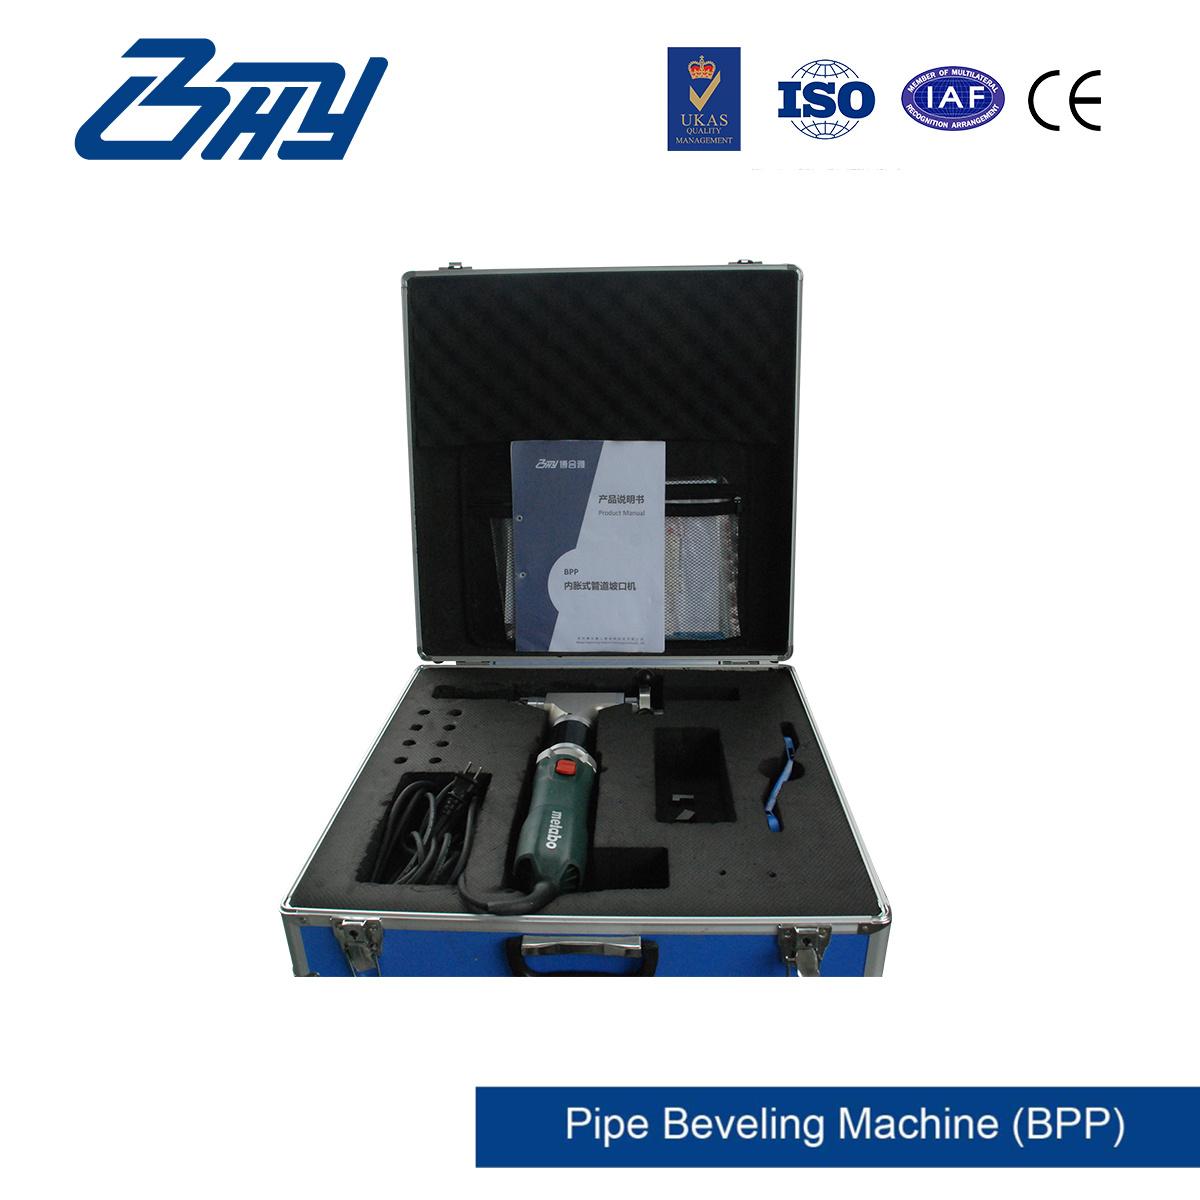 Portable Pipe Beveling Machine/Pipe Beveler (BPP4E)